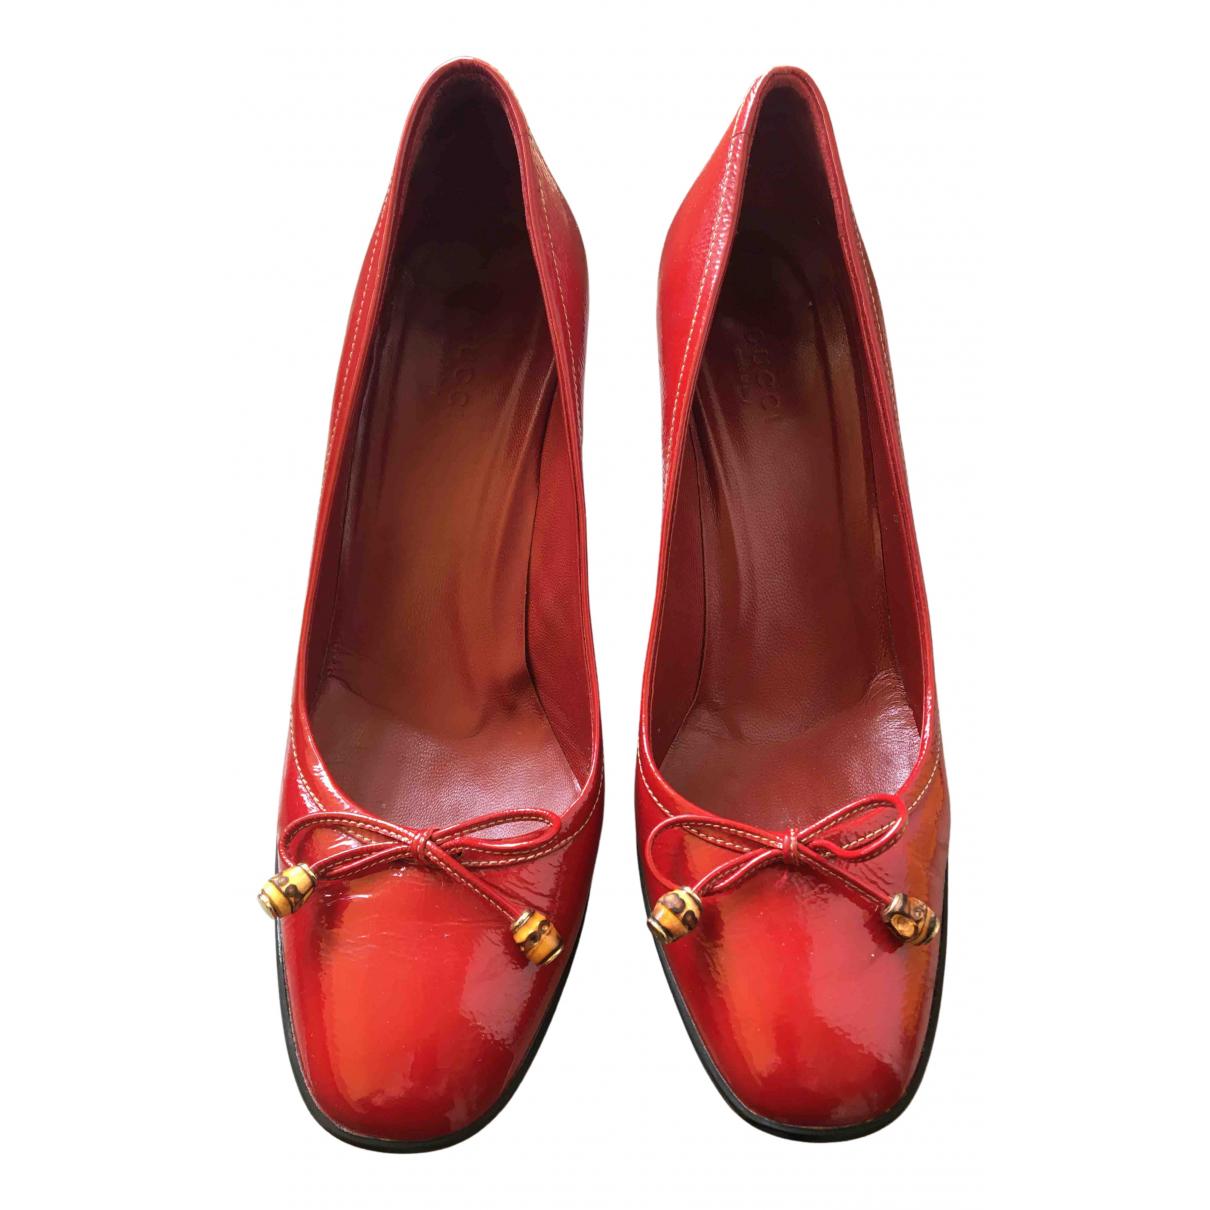 Gucci \N Ballerinas in  Rot Lackleder